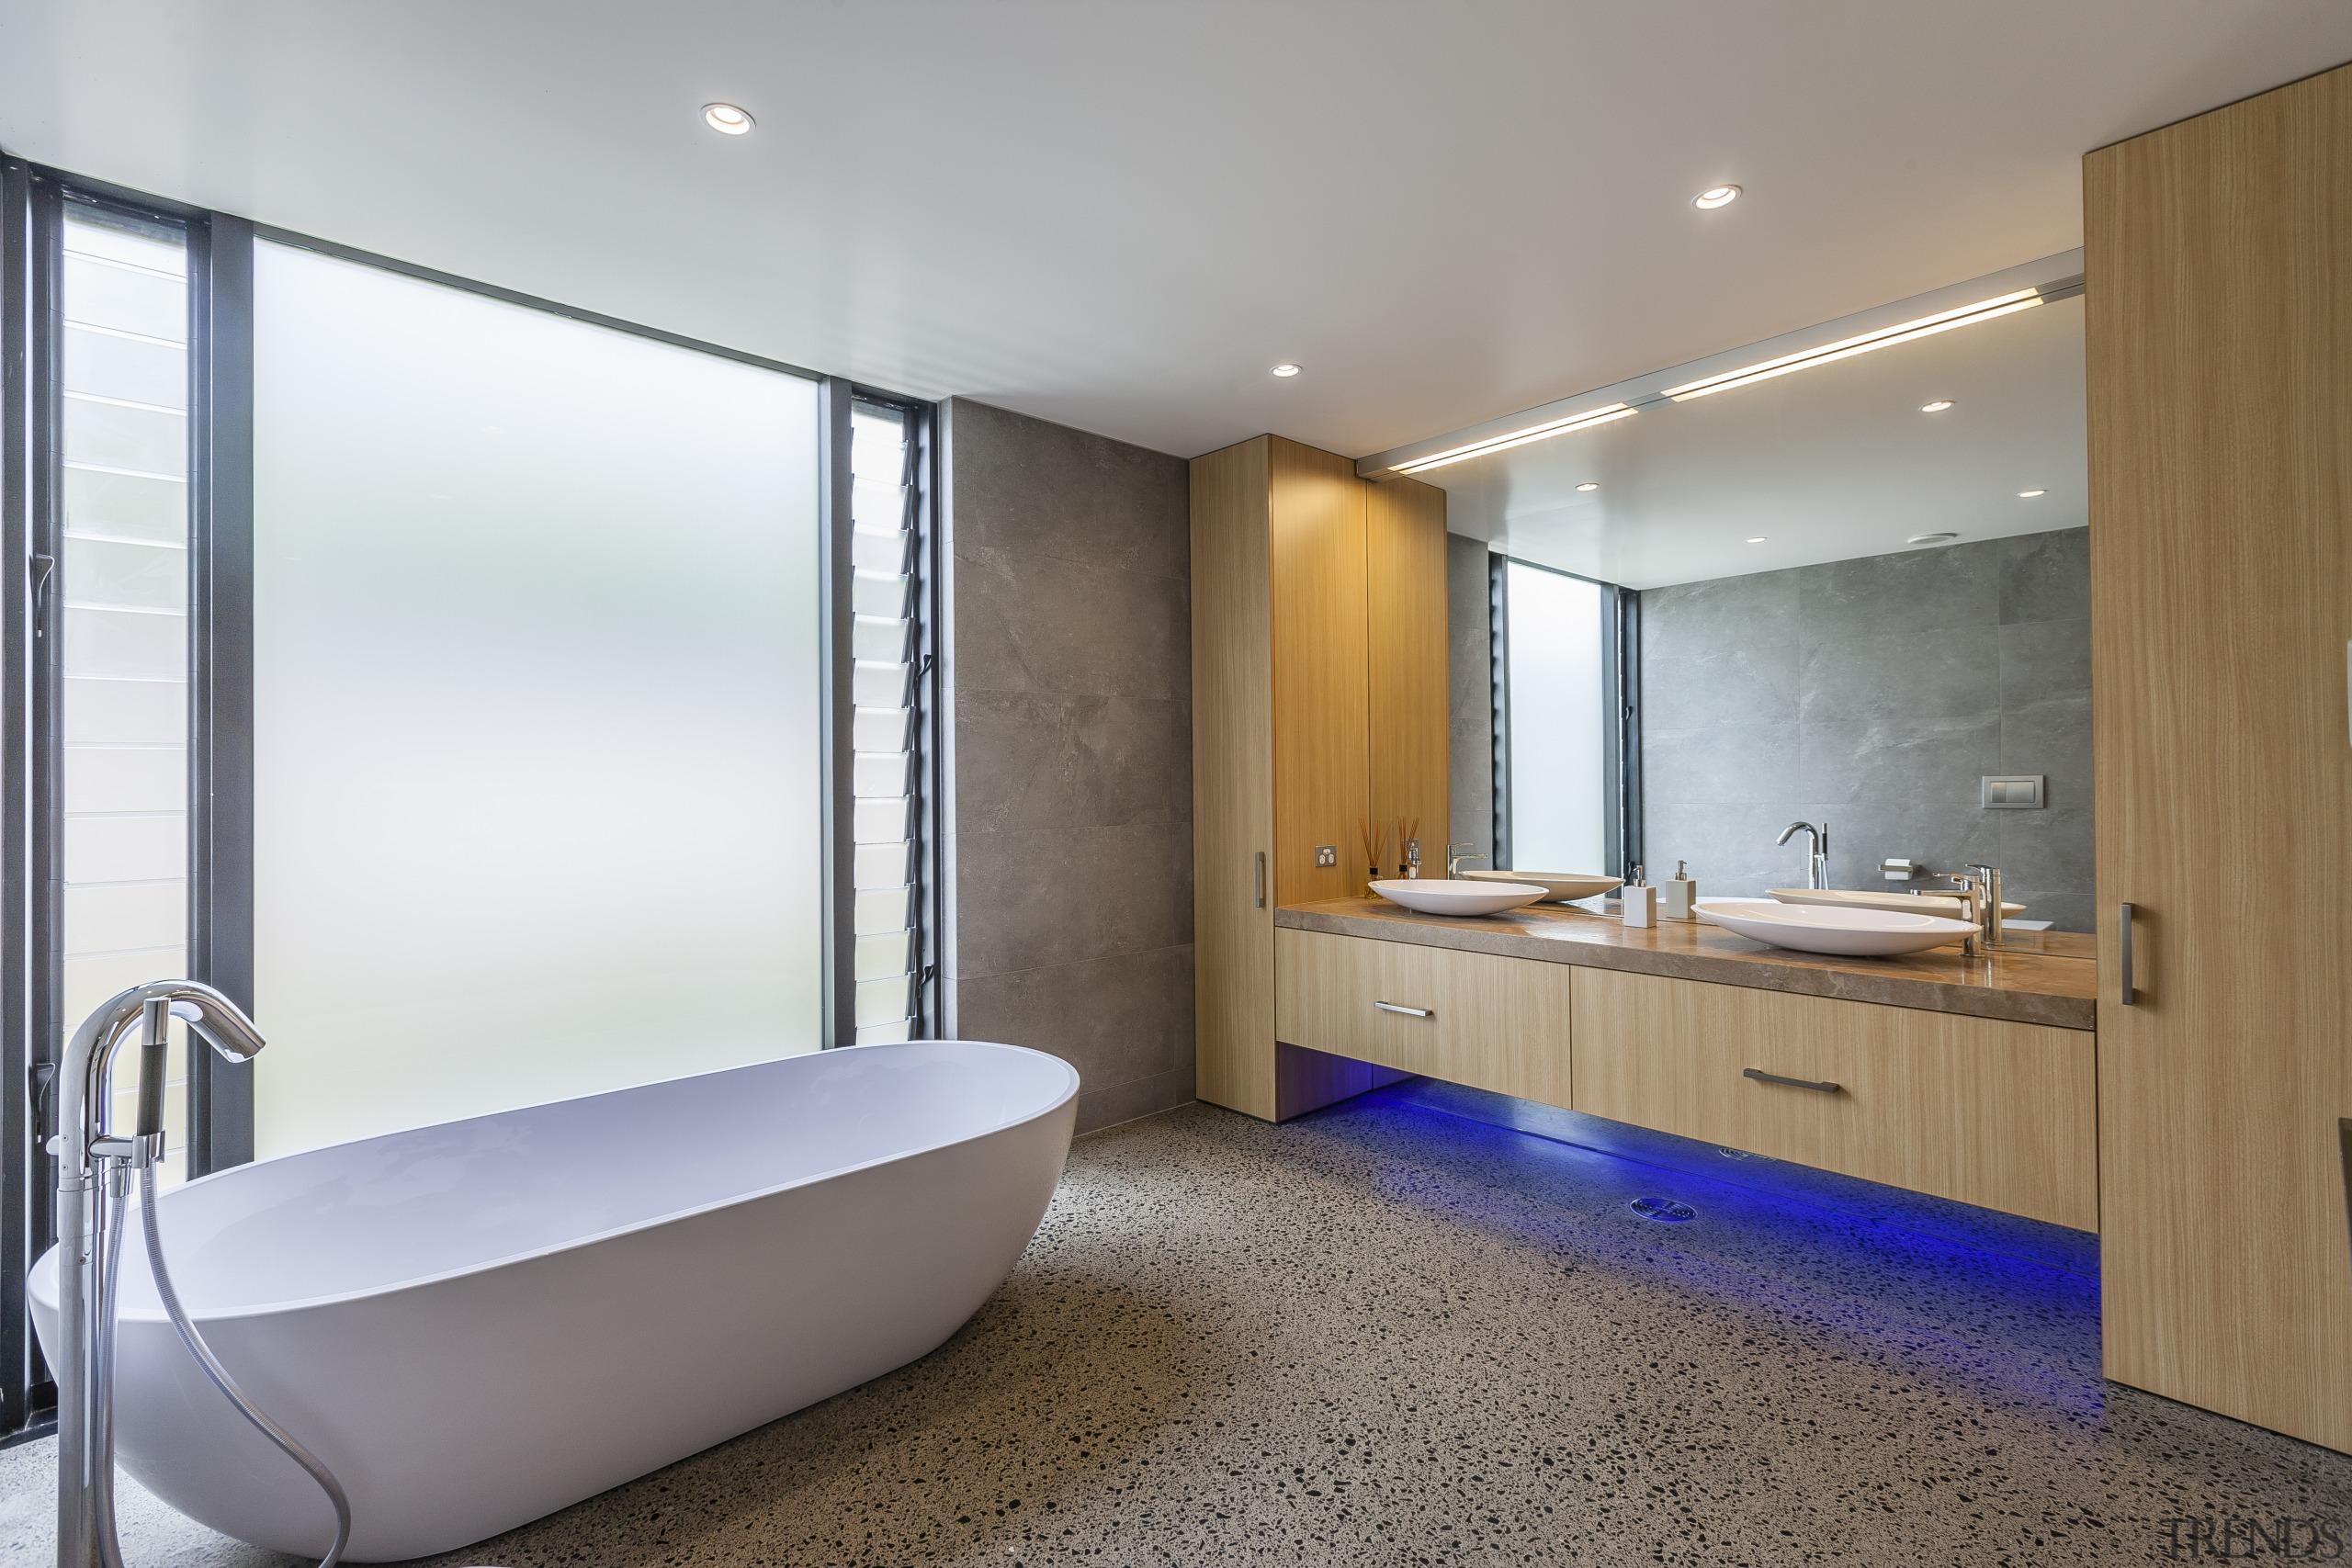 Atmospheric lighting and a freestanding tub accompany bespoke